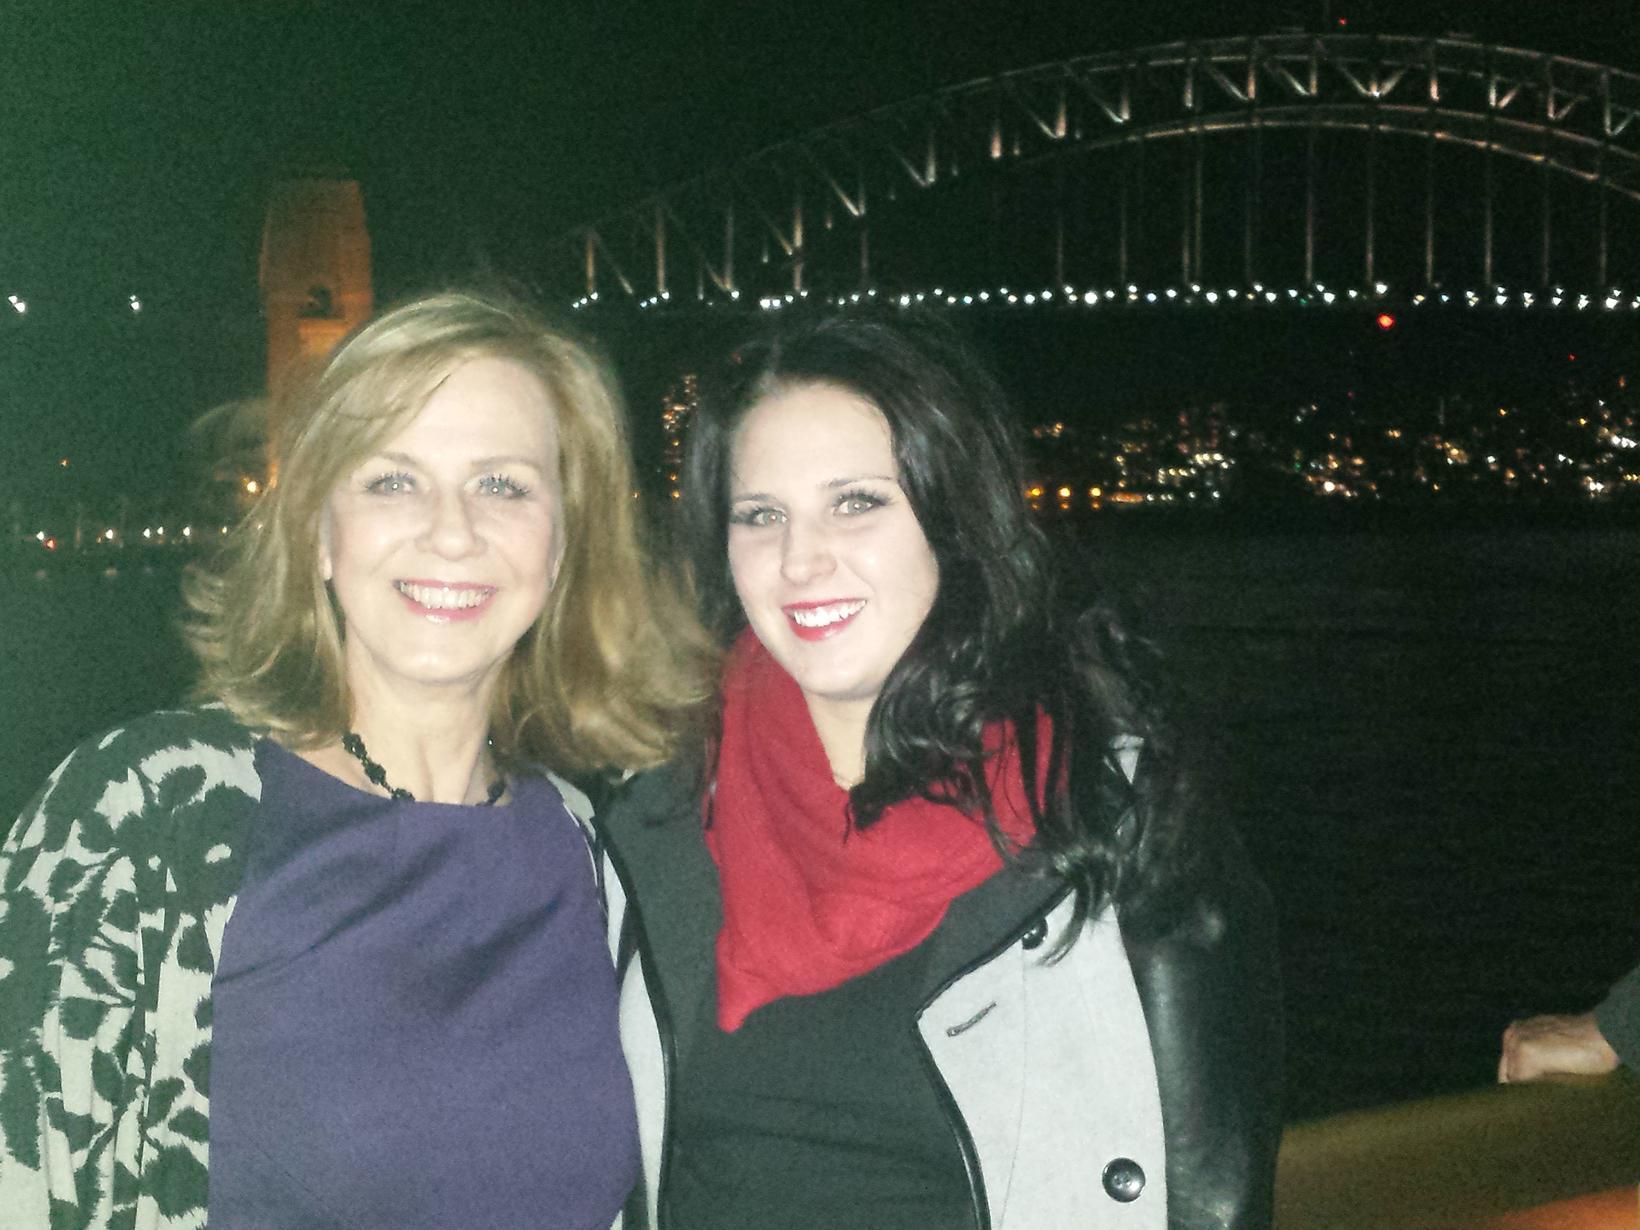 Carol from Leonay, New South Wales, Australia